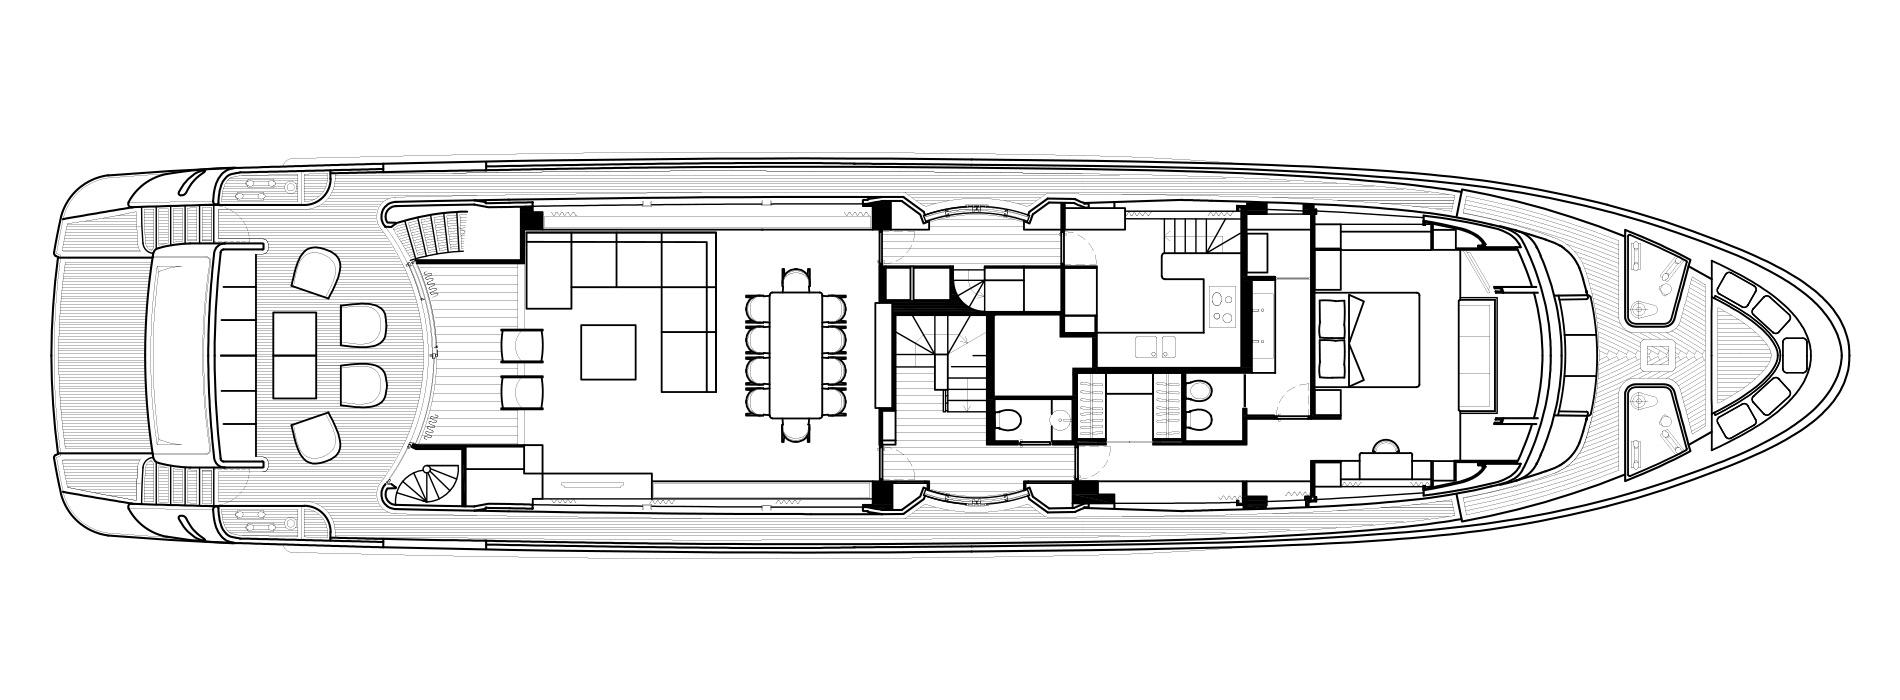 Sanlorenzo Yachts SD112 主甲板 Versione A